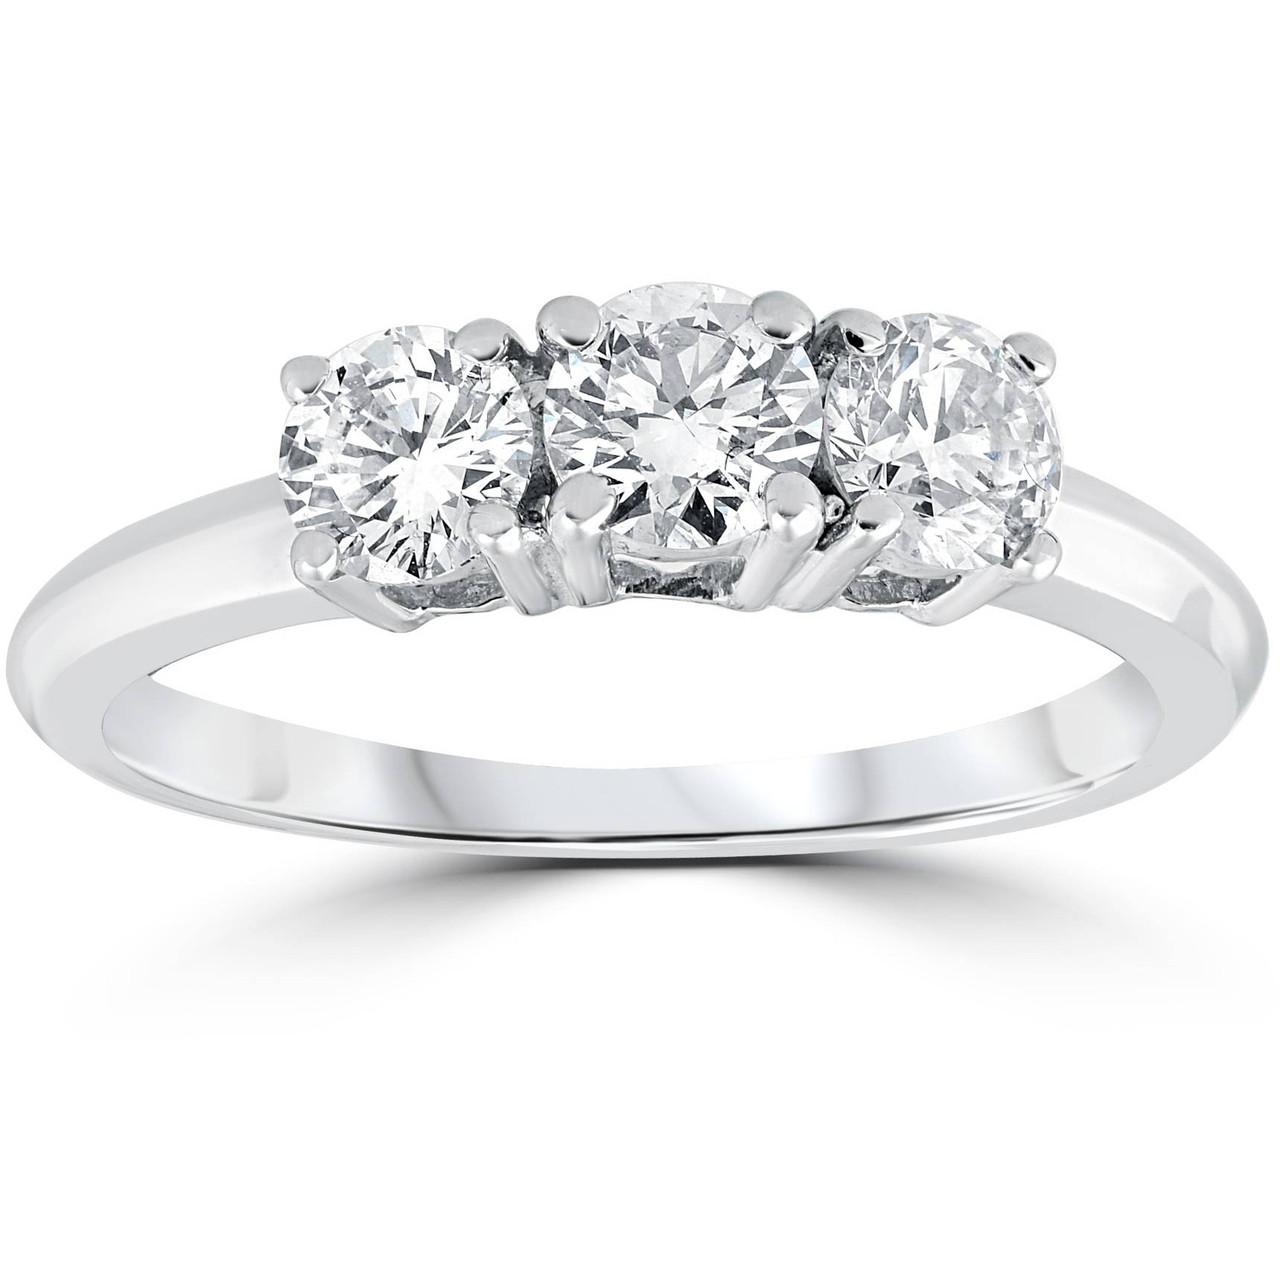 1 Carat 3 Stone Diamond Engagement Ring Solitaire Round